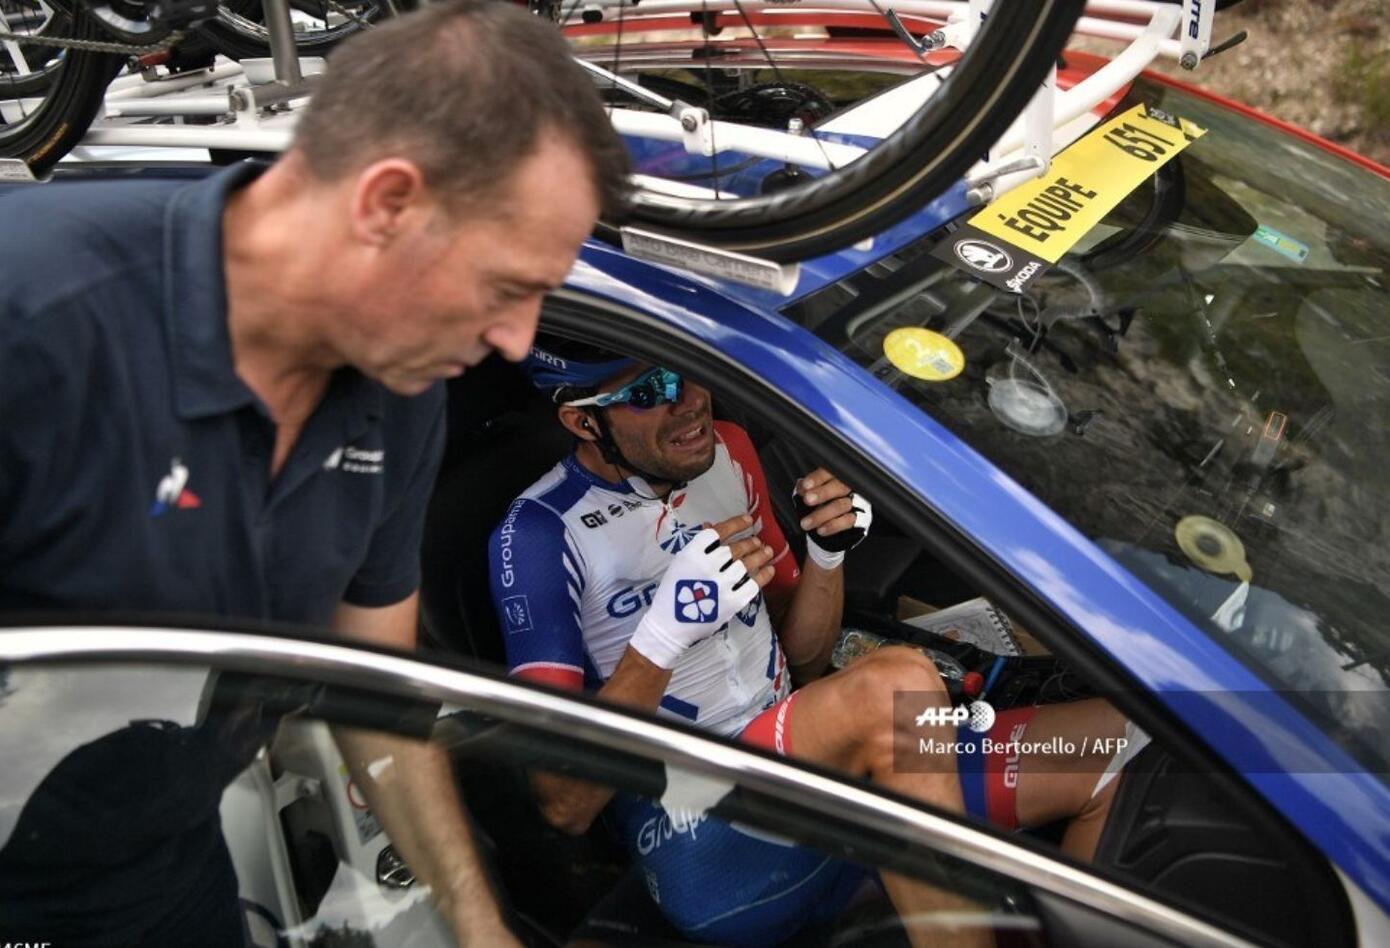 El ciclista del Groupama acudió al coche médico a falta de 93 kilómetros